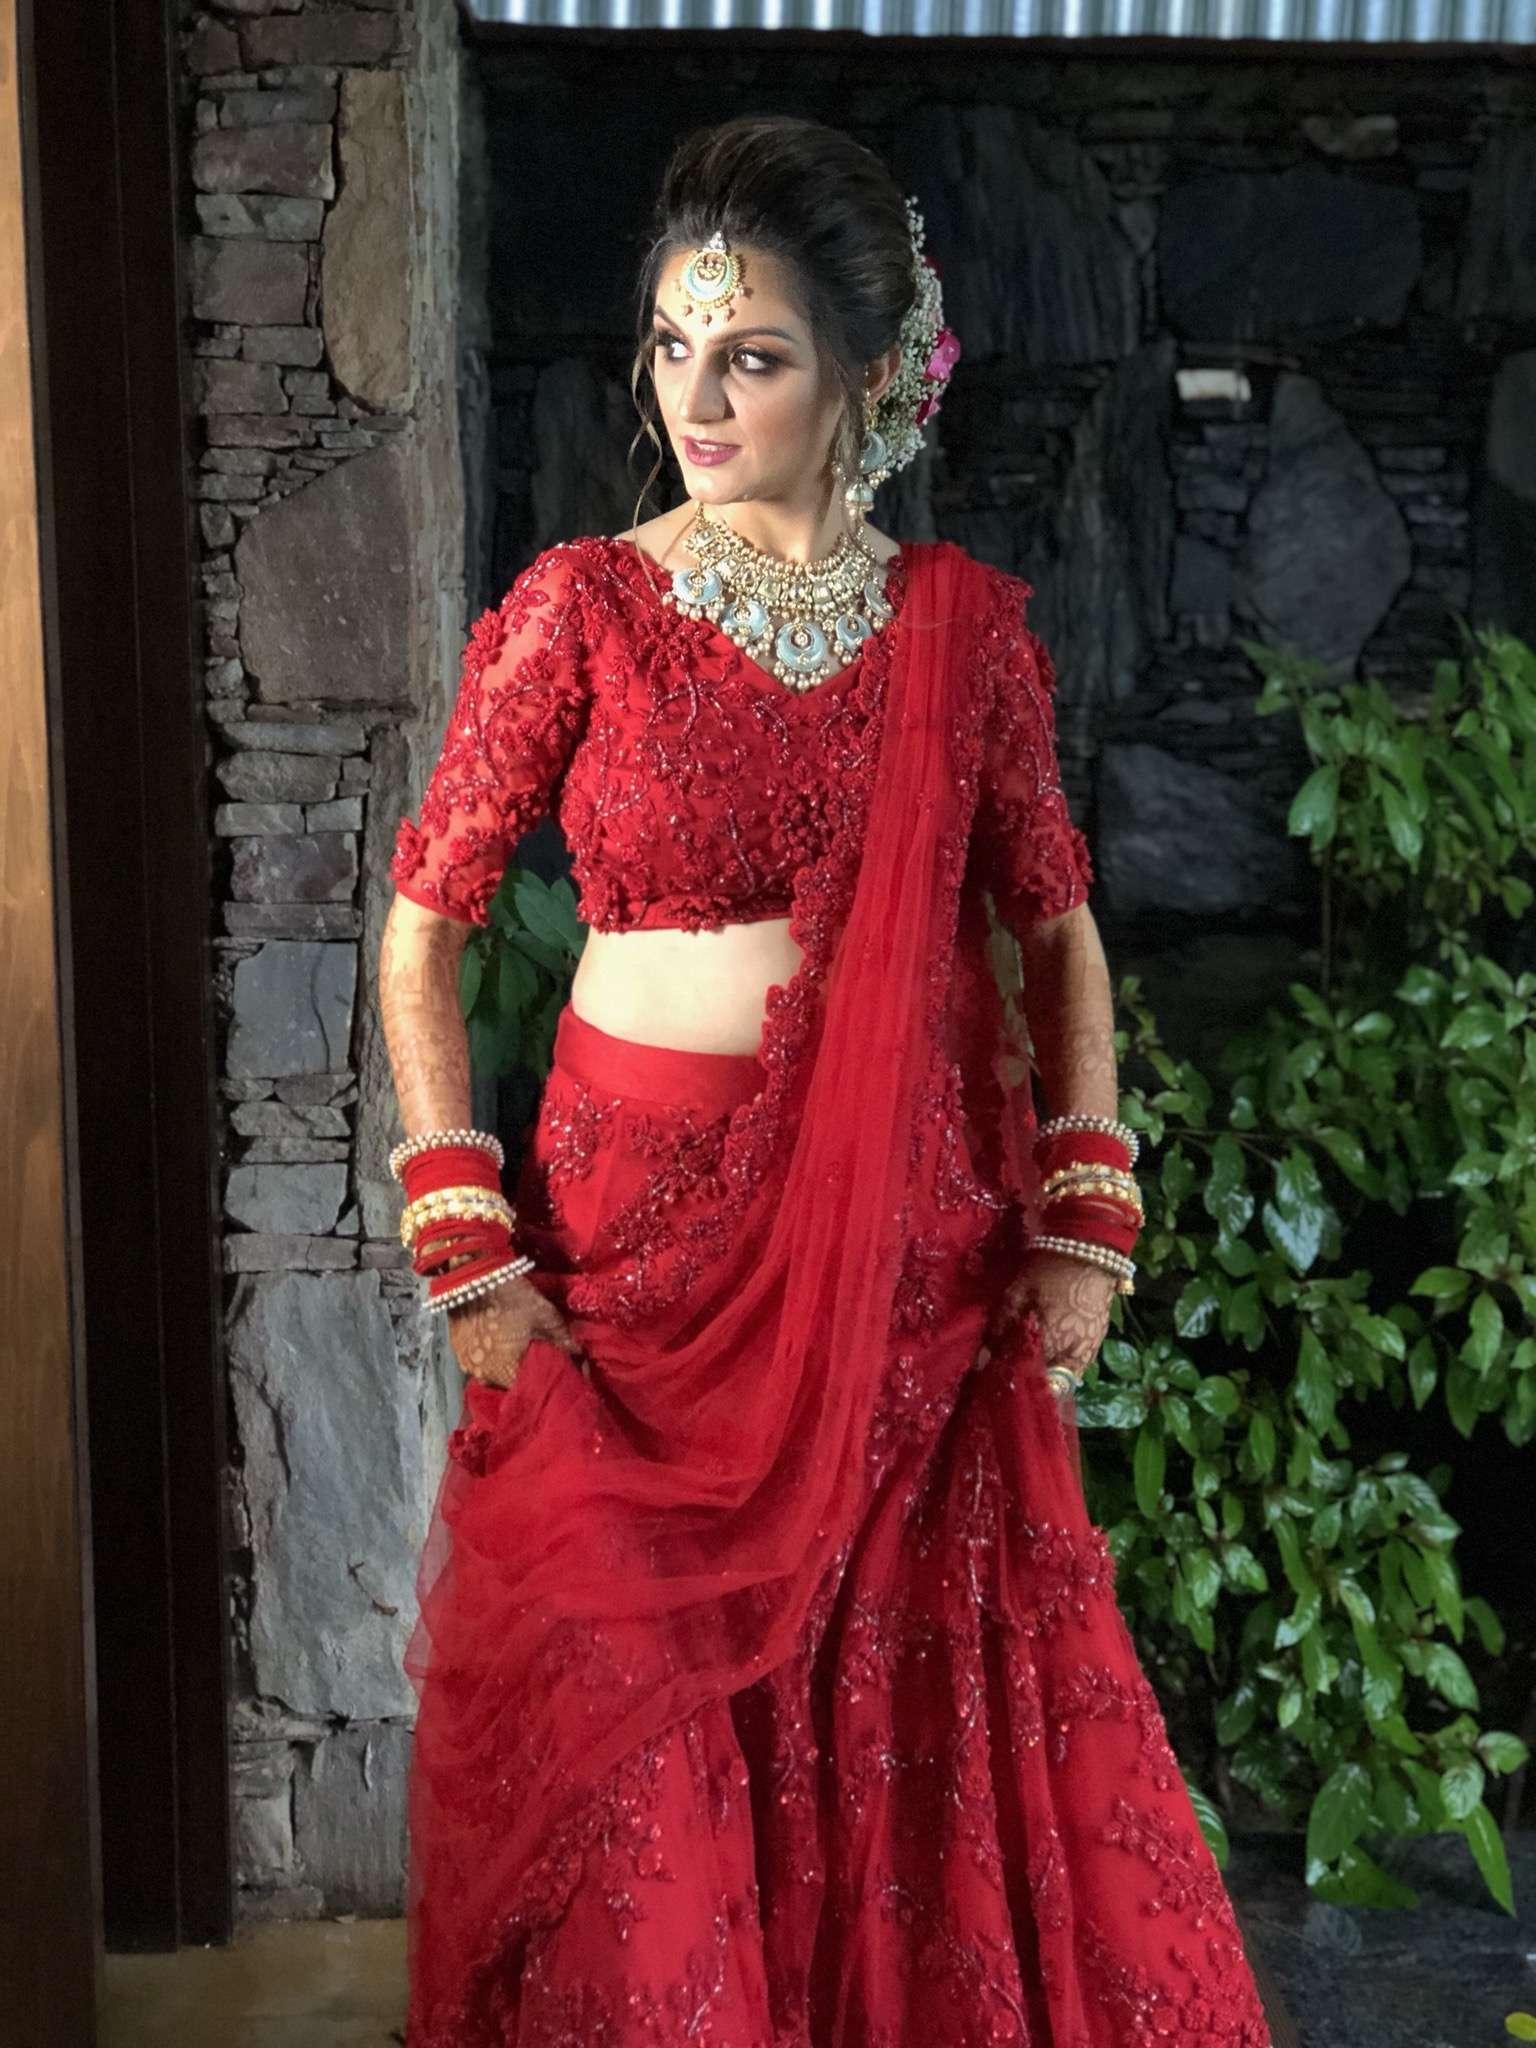 #RealBridesOfKalki: Presenting Pari, who looked like a real-life fairy in a monochrome red lehenga!